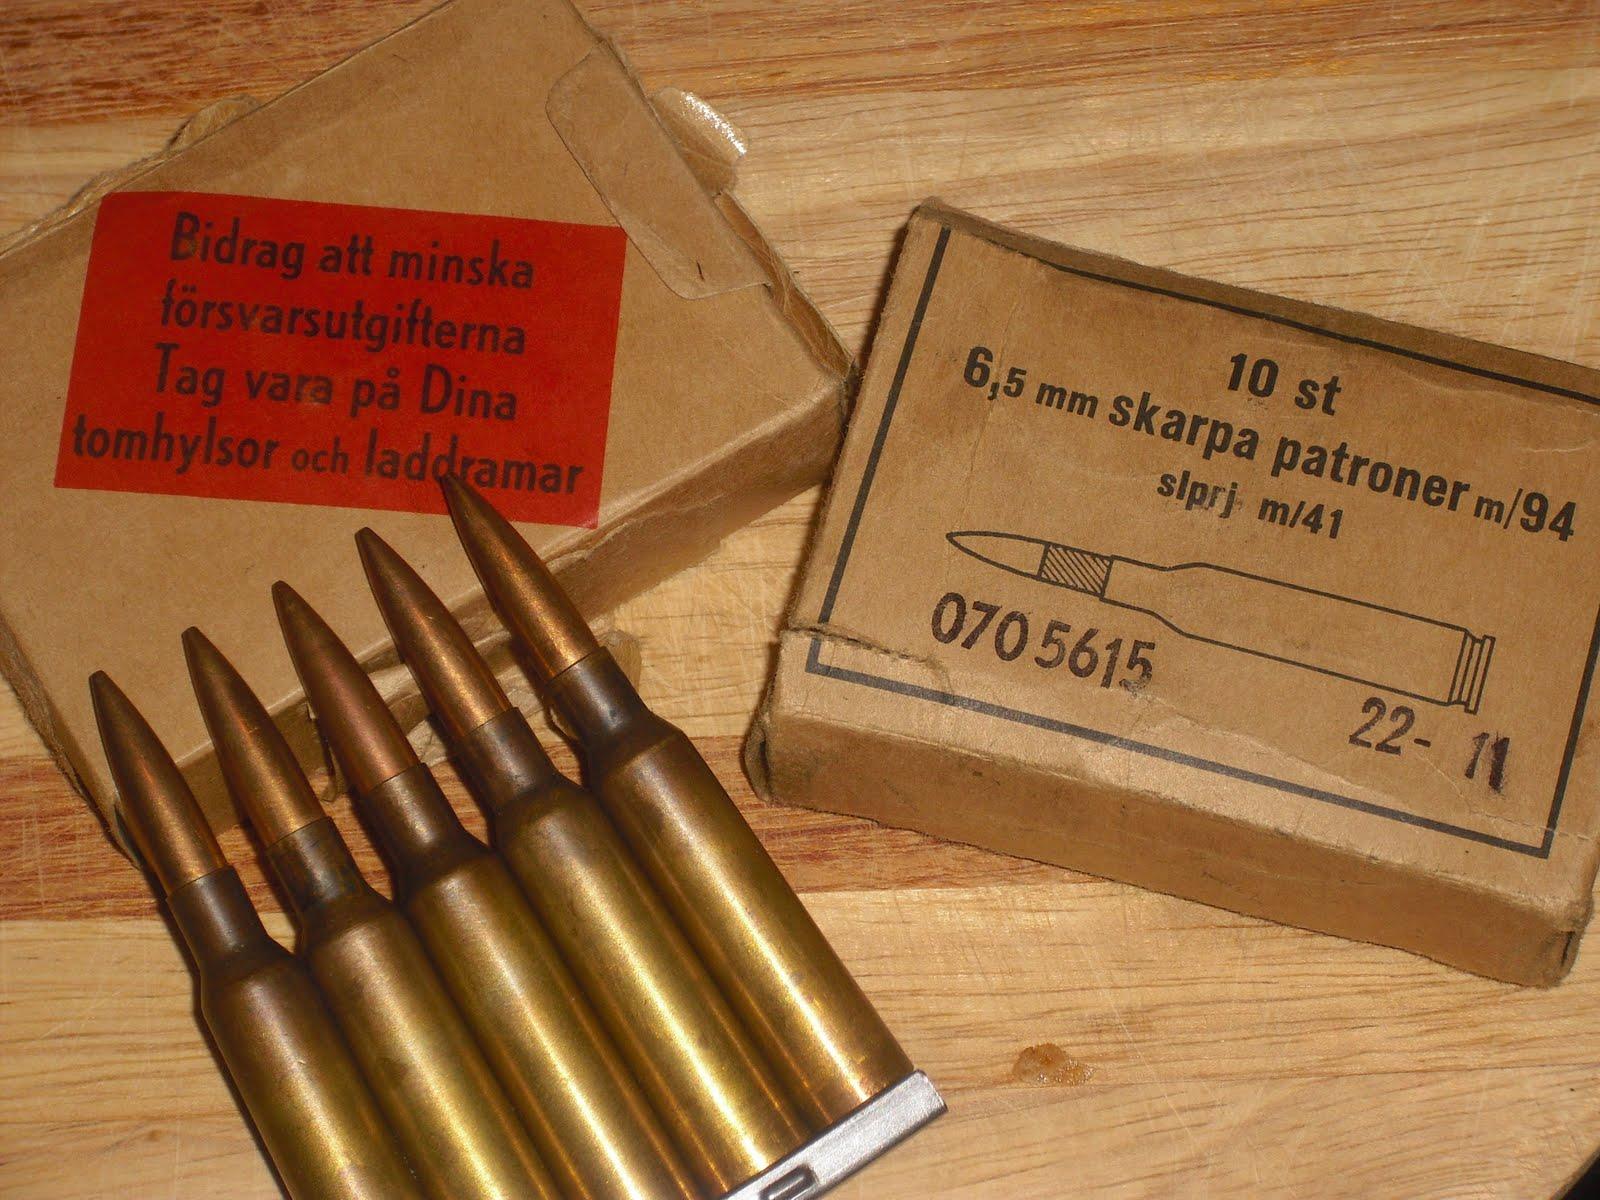 swedish mauser some old m 94 surplus ammo